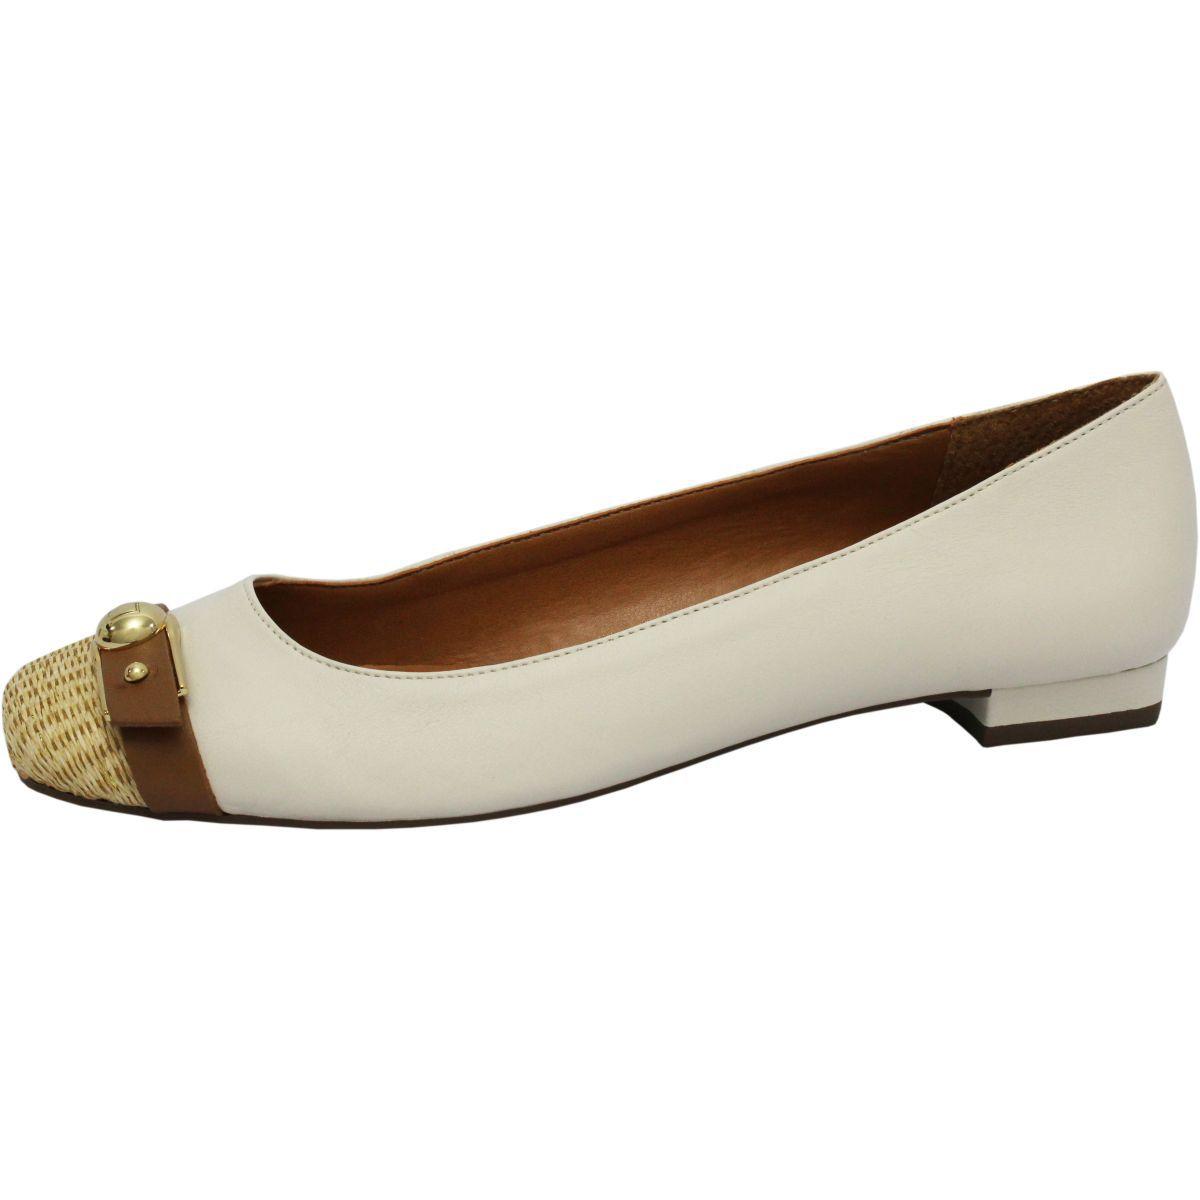 9bc833dc7 SAPATILHA LUZ DA LUA S45243V18 OURO - Dimazzee Shoes & Bags